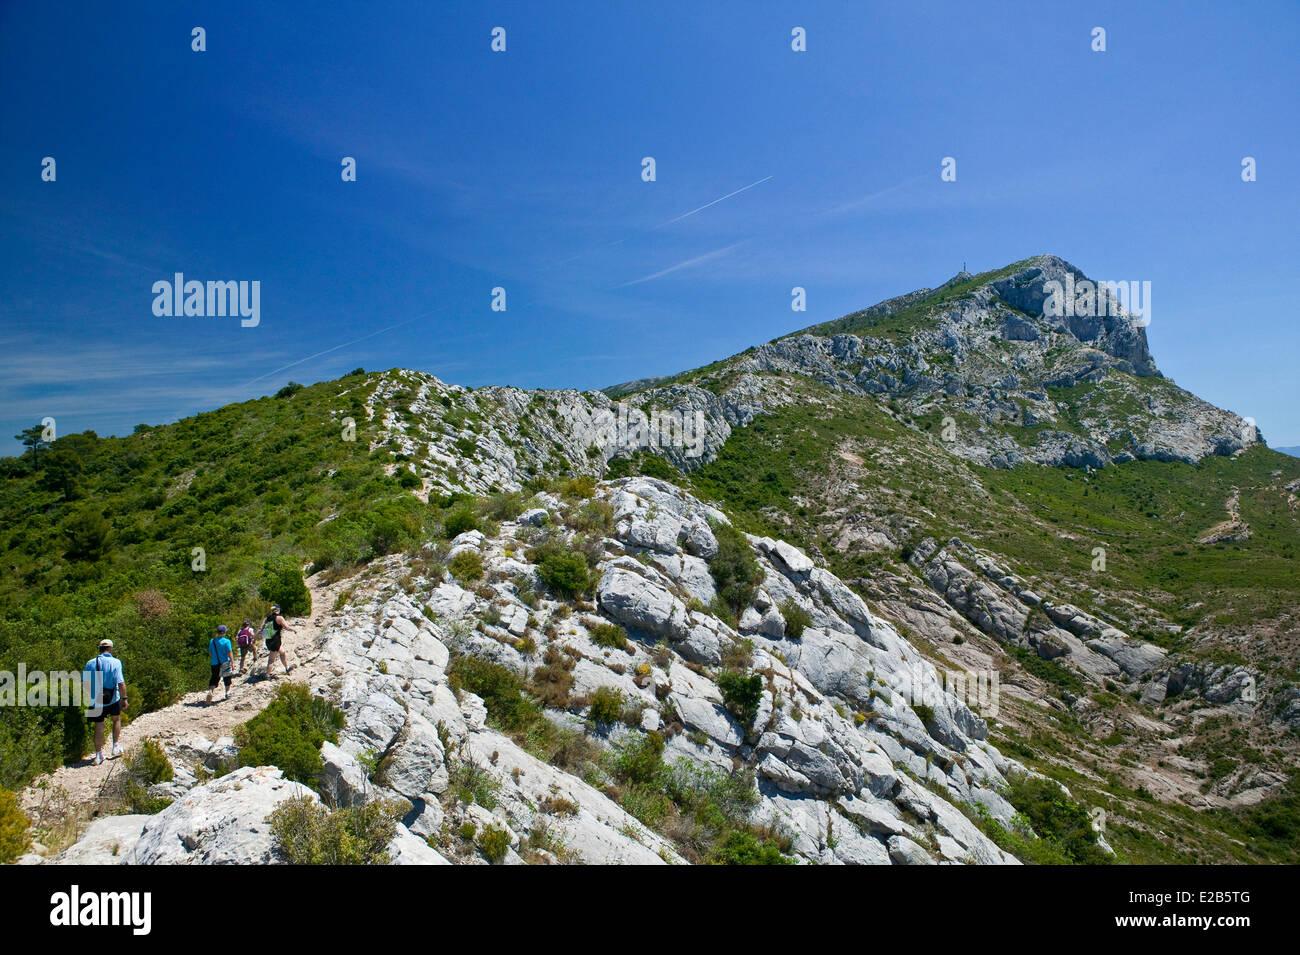 Francia, Bouches du Rhone, Montagne Sainte Victoire Immagini Stock